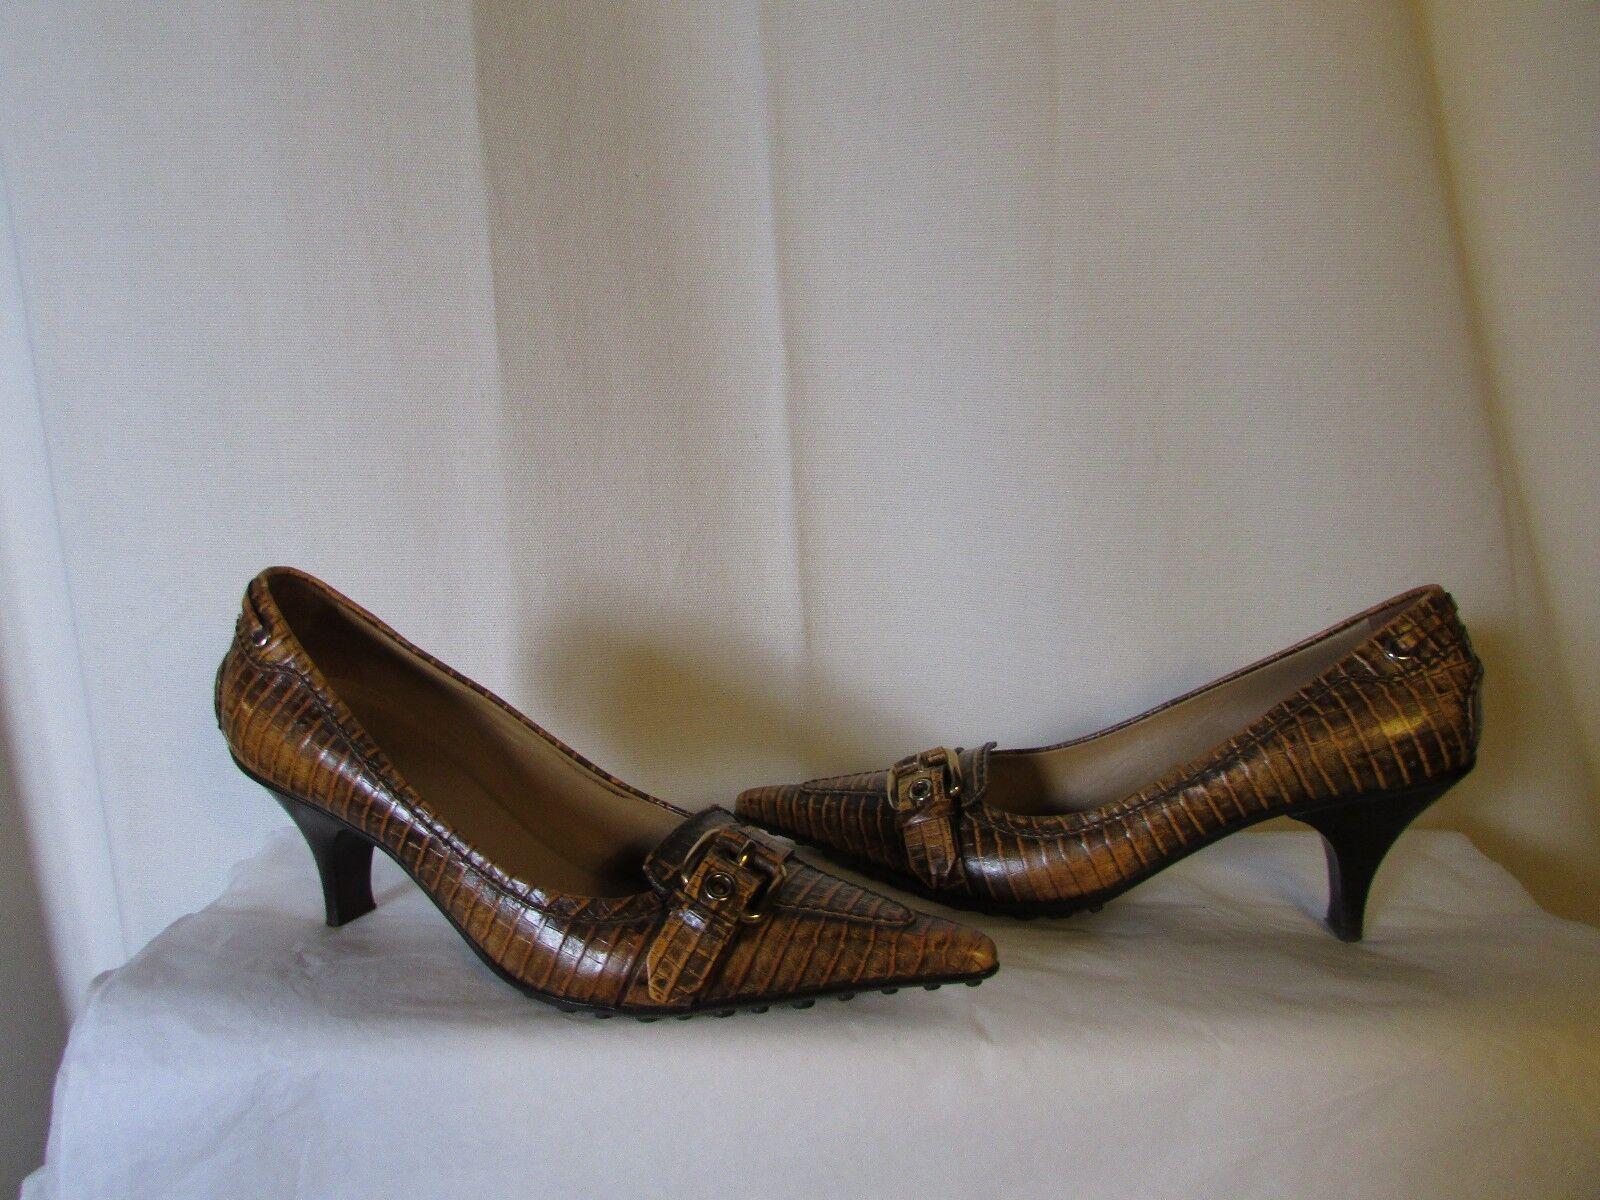 Escarpins THE ORIGINAL  CAR scarpe cuir caramel Marronee façon reptile 37   acquistare    Uomini/Donna Scarpa